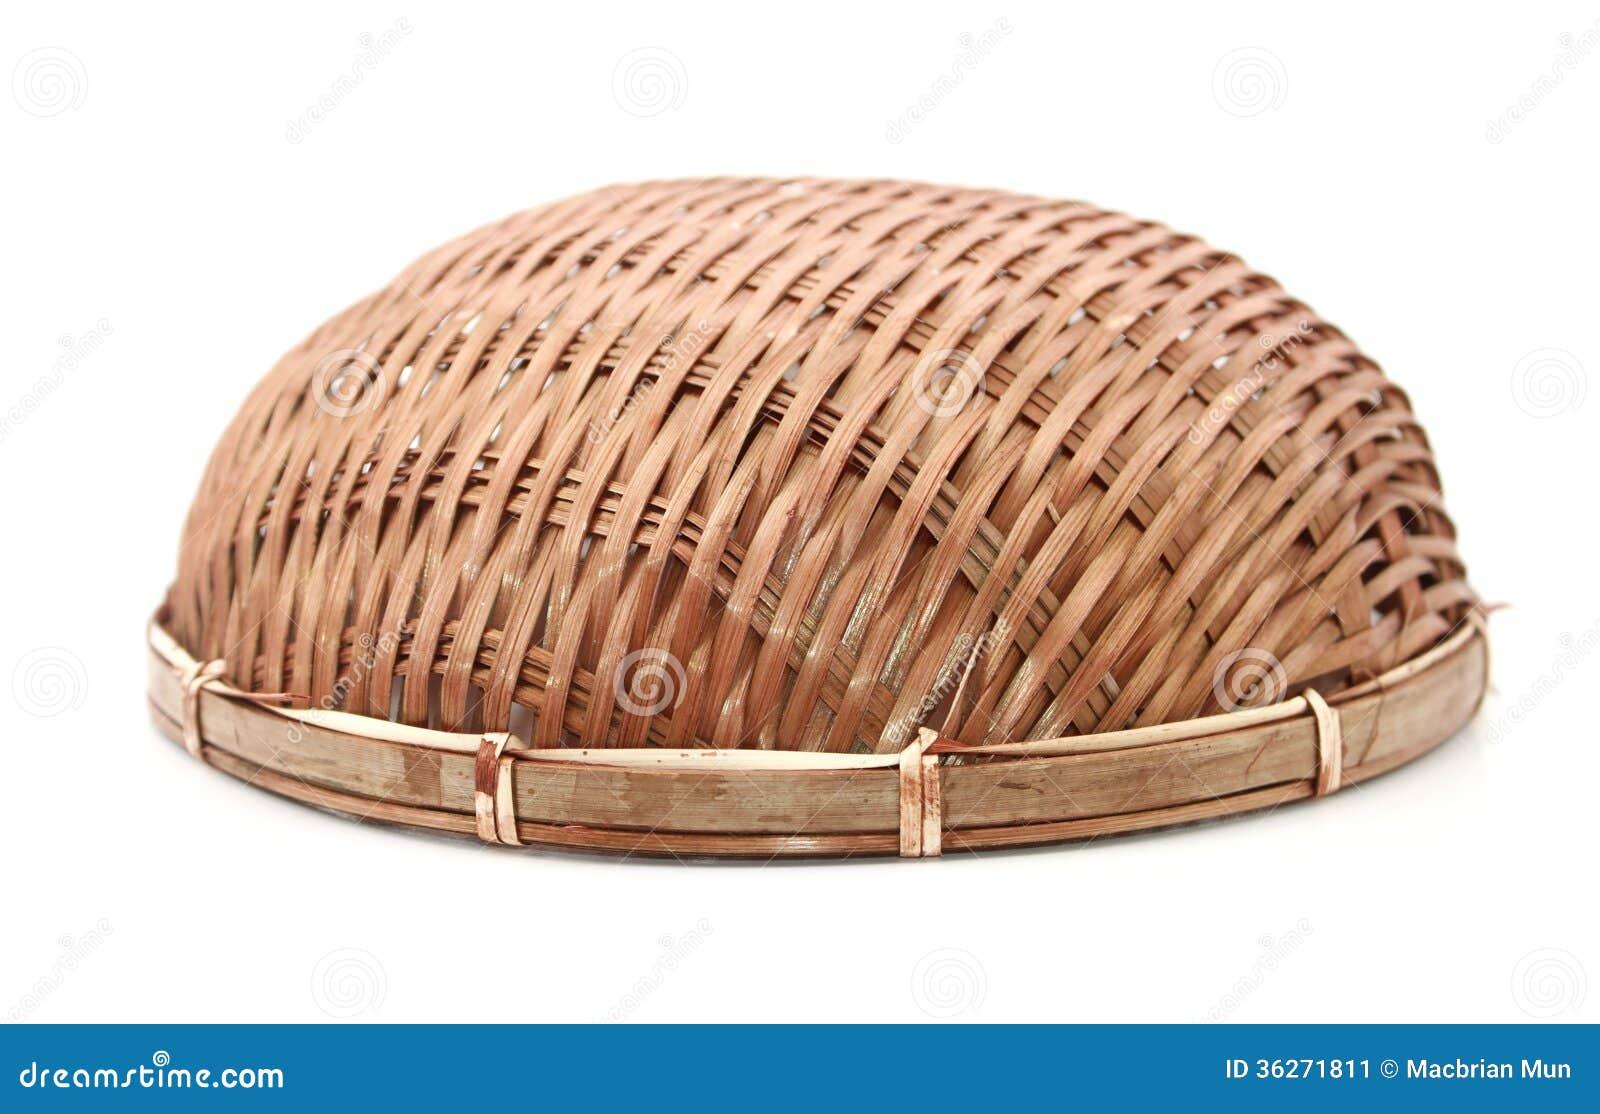 bambuskorb ber wei stockbild bild von kunst frech. Black Bedroom Furniture Sets. Home Design Ideas